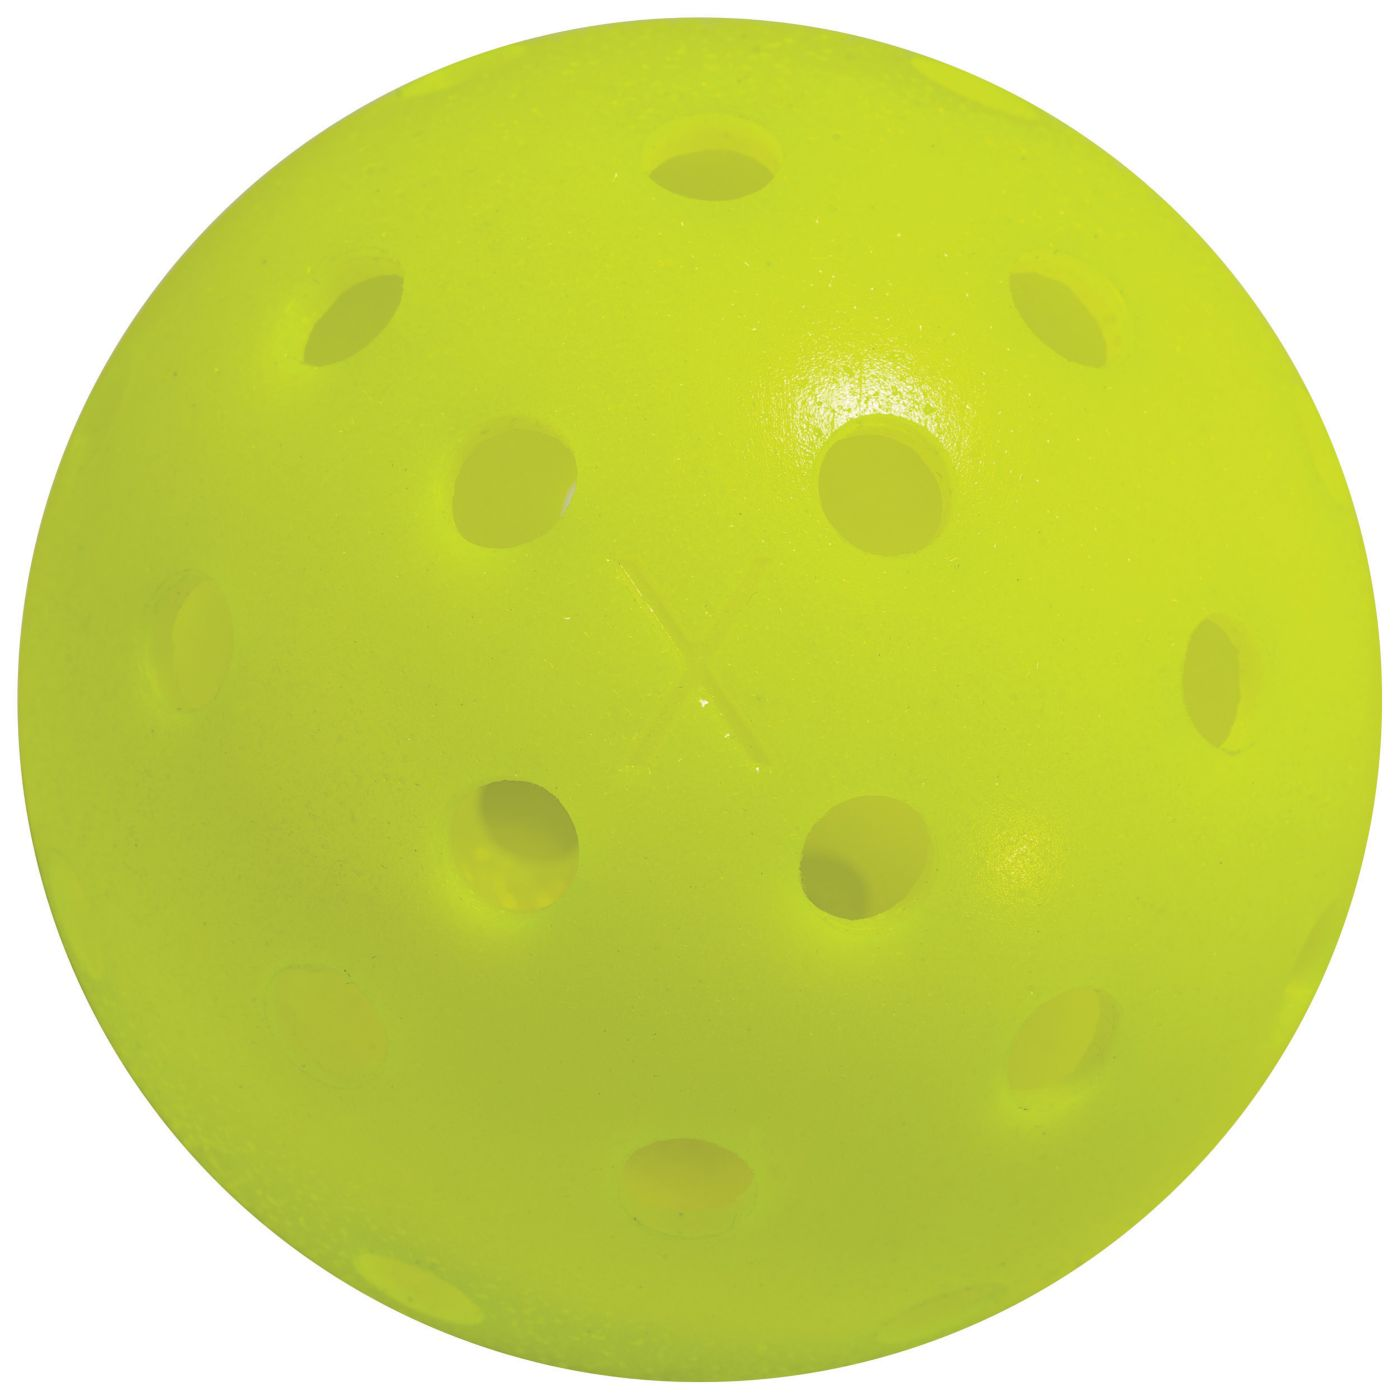 Franklin X-40 Performance Outdoor Pickleball Balls- 12 Pack